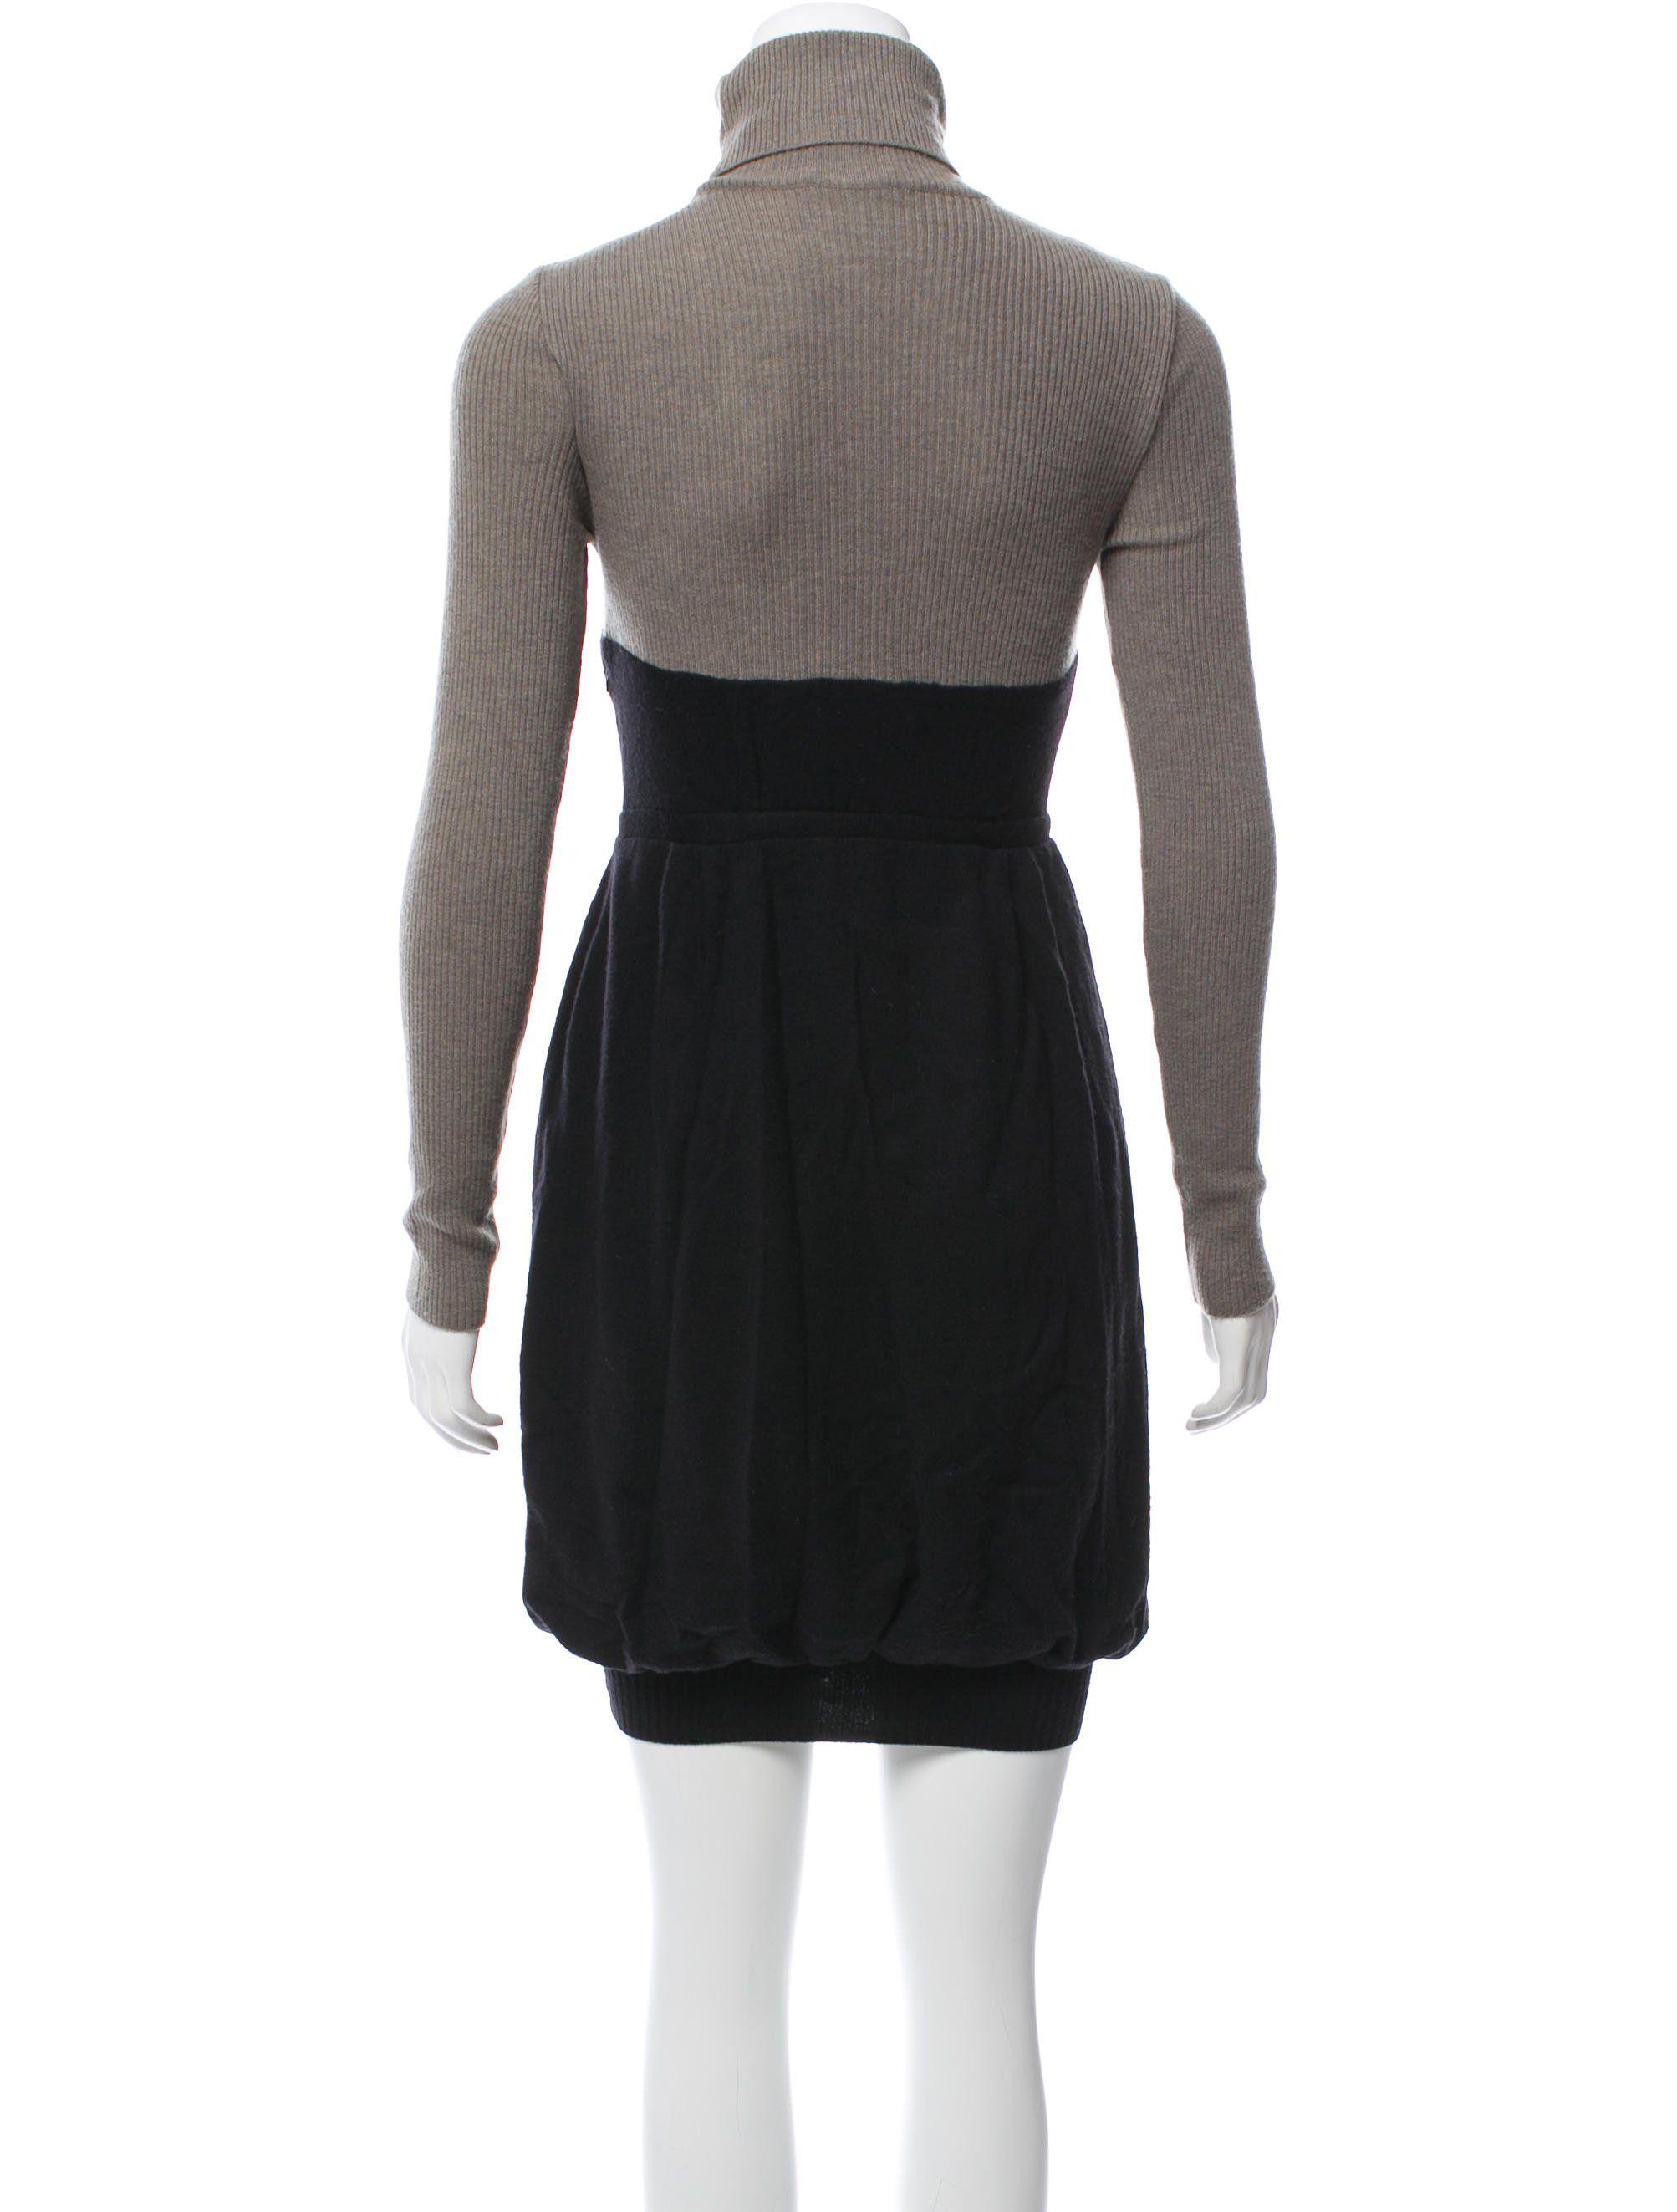 8f0574ecad5 Virgin Wool Turtleneck Dress in 2019 | Edgy Fashion Casual | Dresses ...